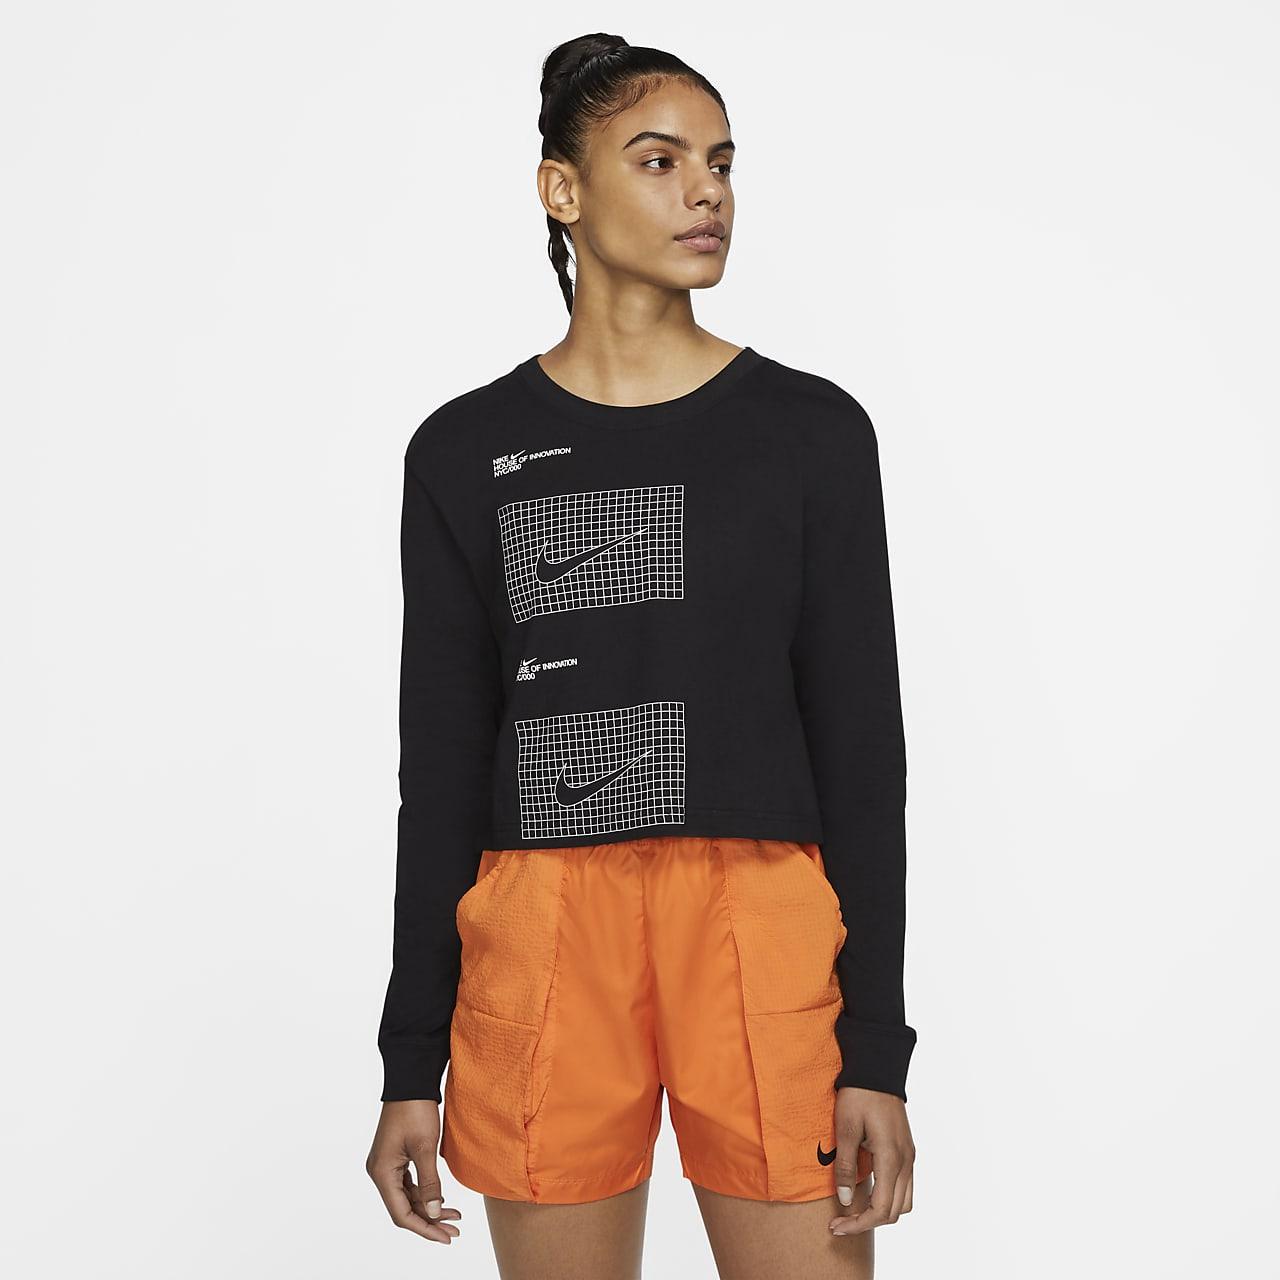 Nike Sportswear House of Innovation (NYC) Women's Long-Sleeve Crop T-Shirt